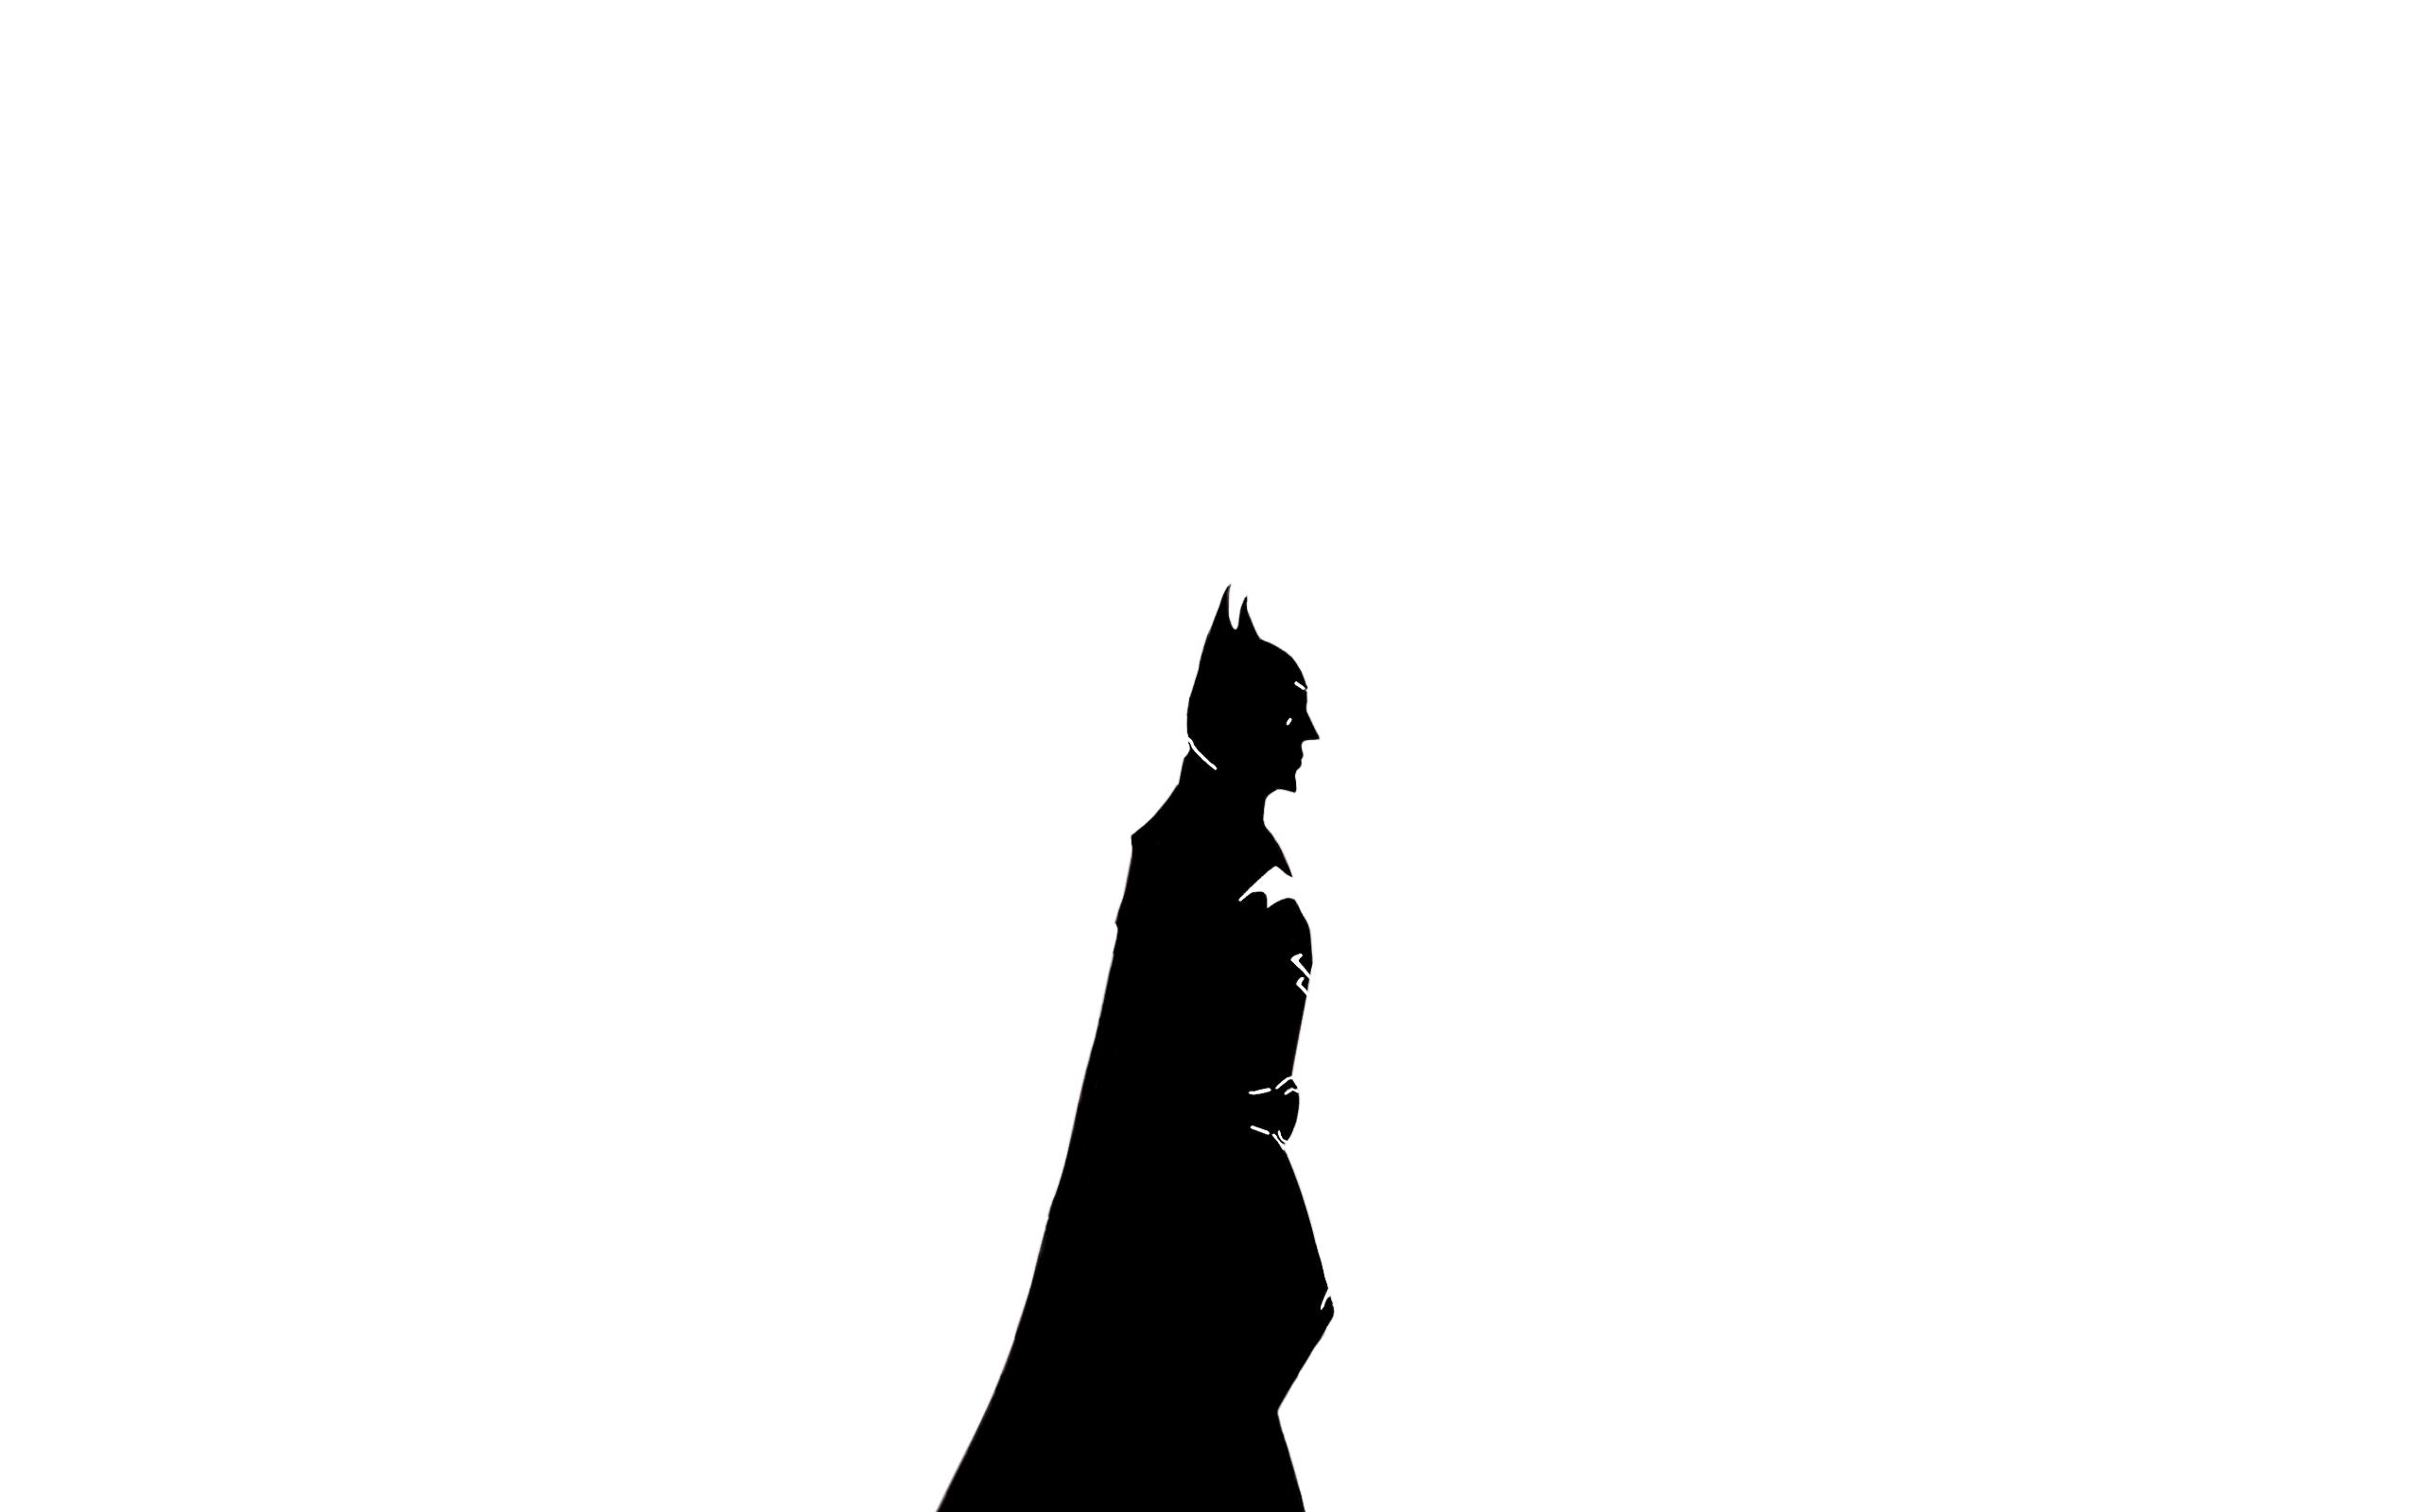 Batman Wallpaper White Version By Zachzaki On Deviantart